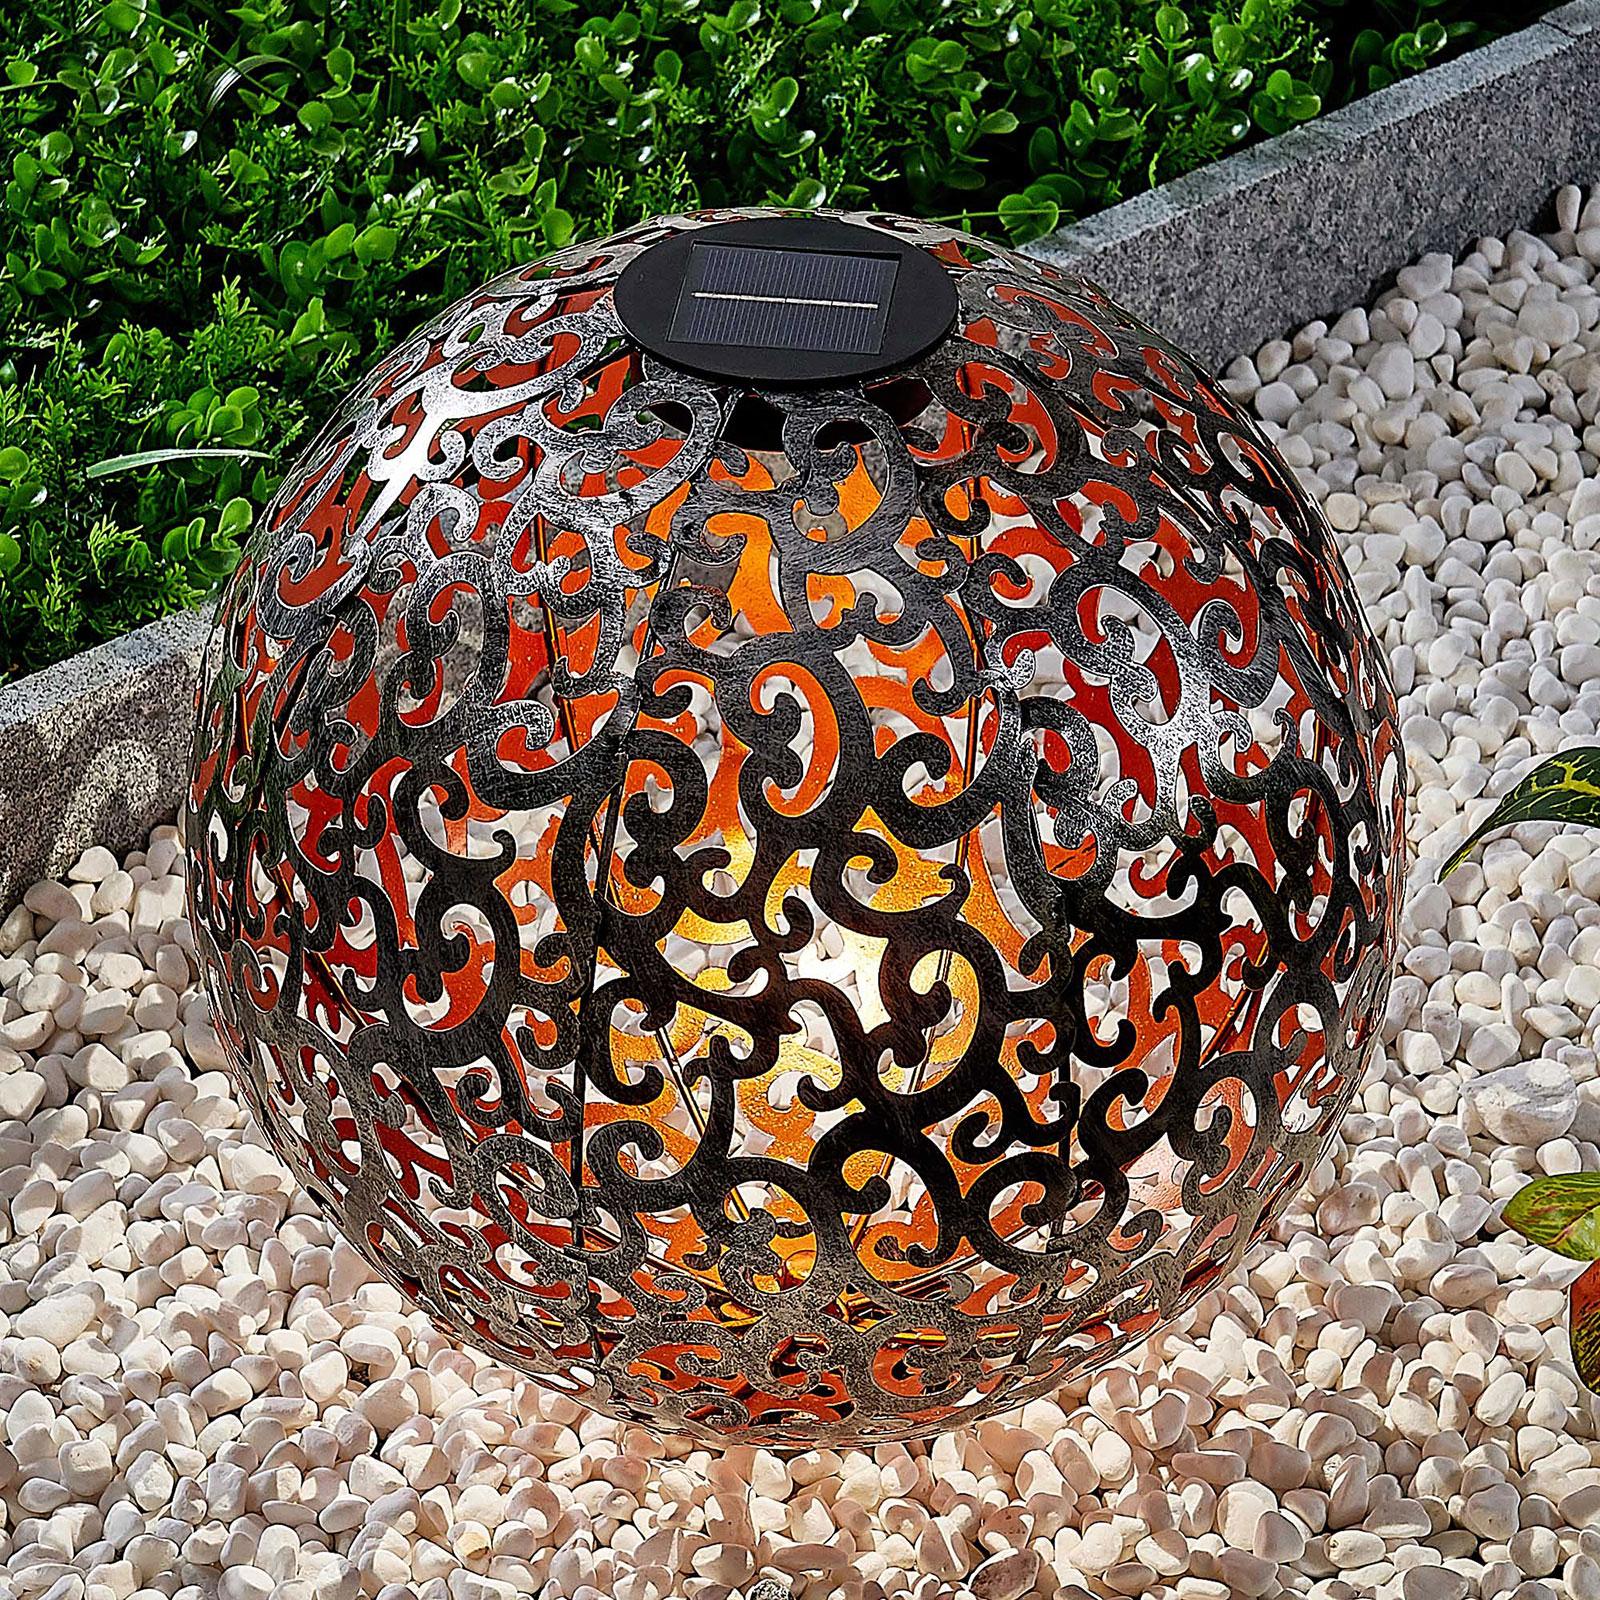 Ornament-LED-solarlampa Eduta, kula, silver-guld